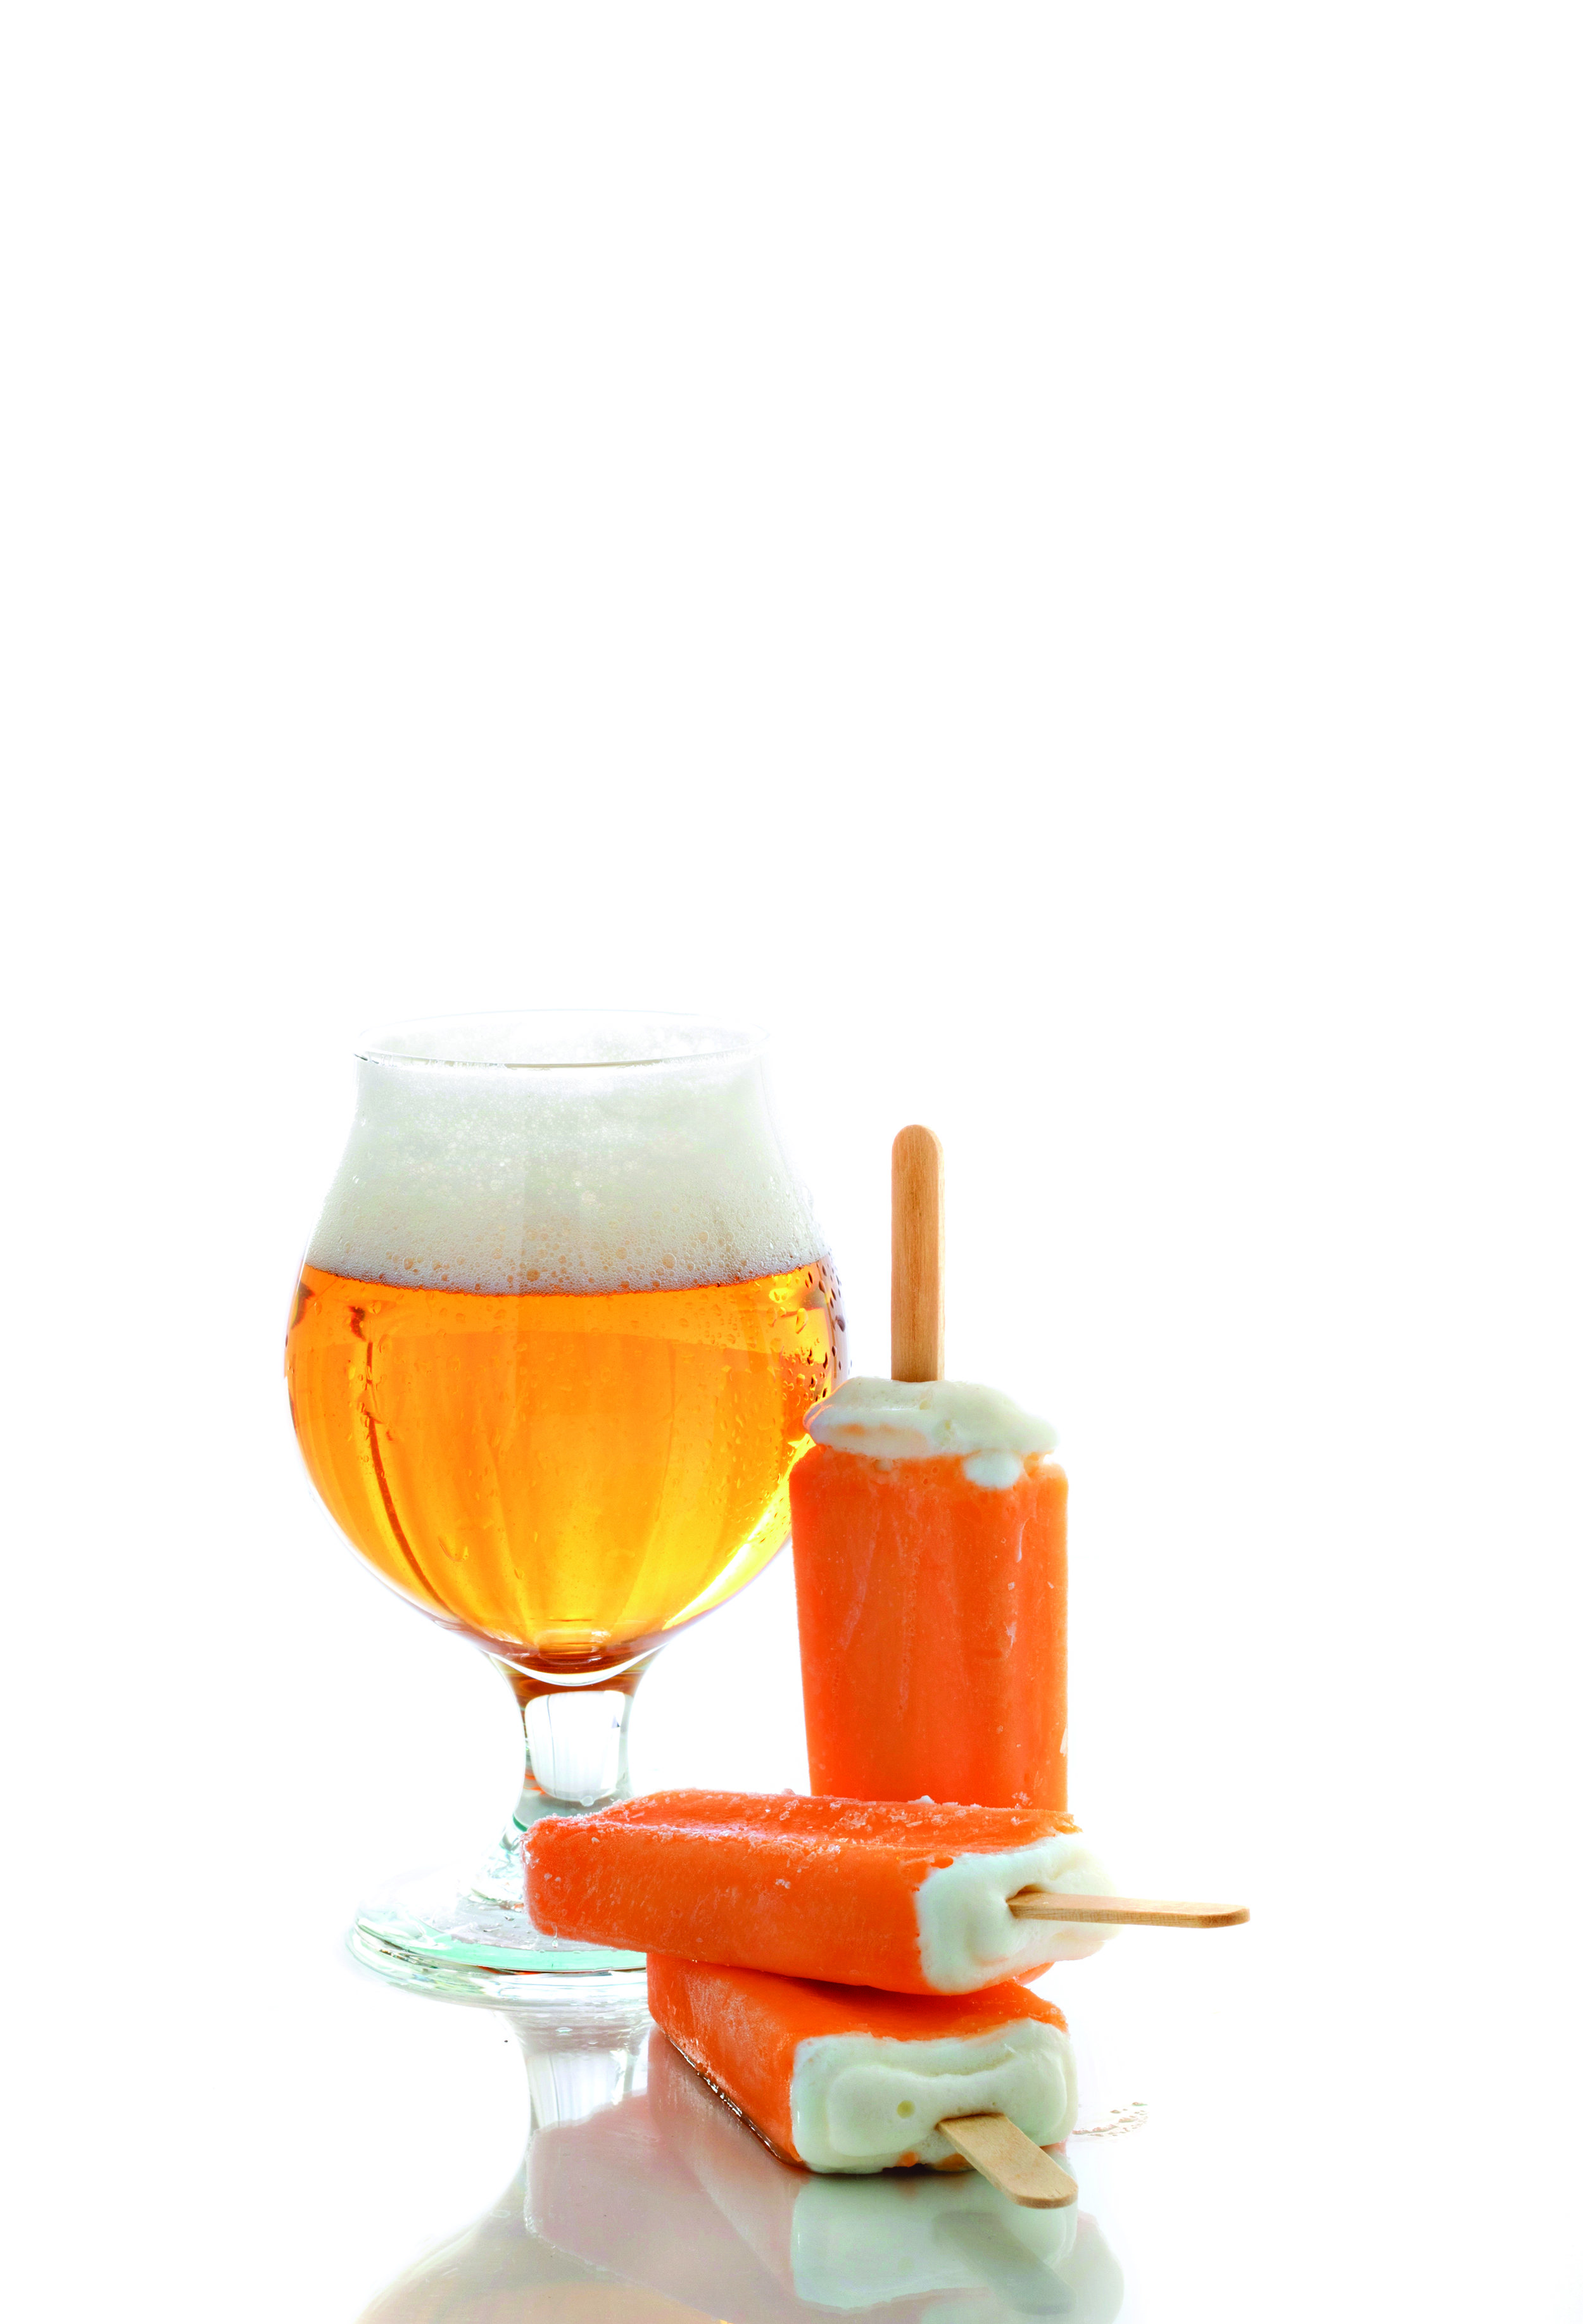 Orange Creamsicle   Style: Ale with orange and vanilla   Brewery: Barrels & Bottles   Location: Golden ABV: 6 percent  IBU: 10     Photo: Angie Wright